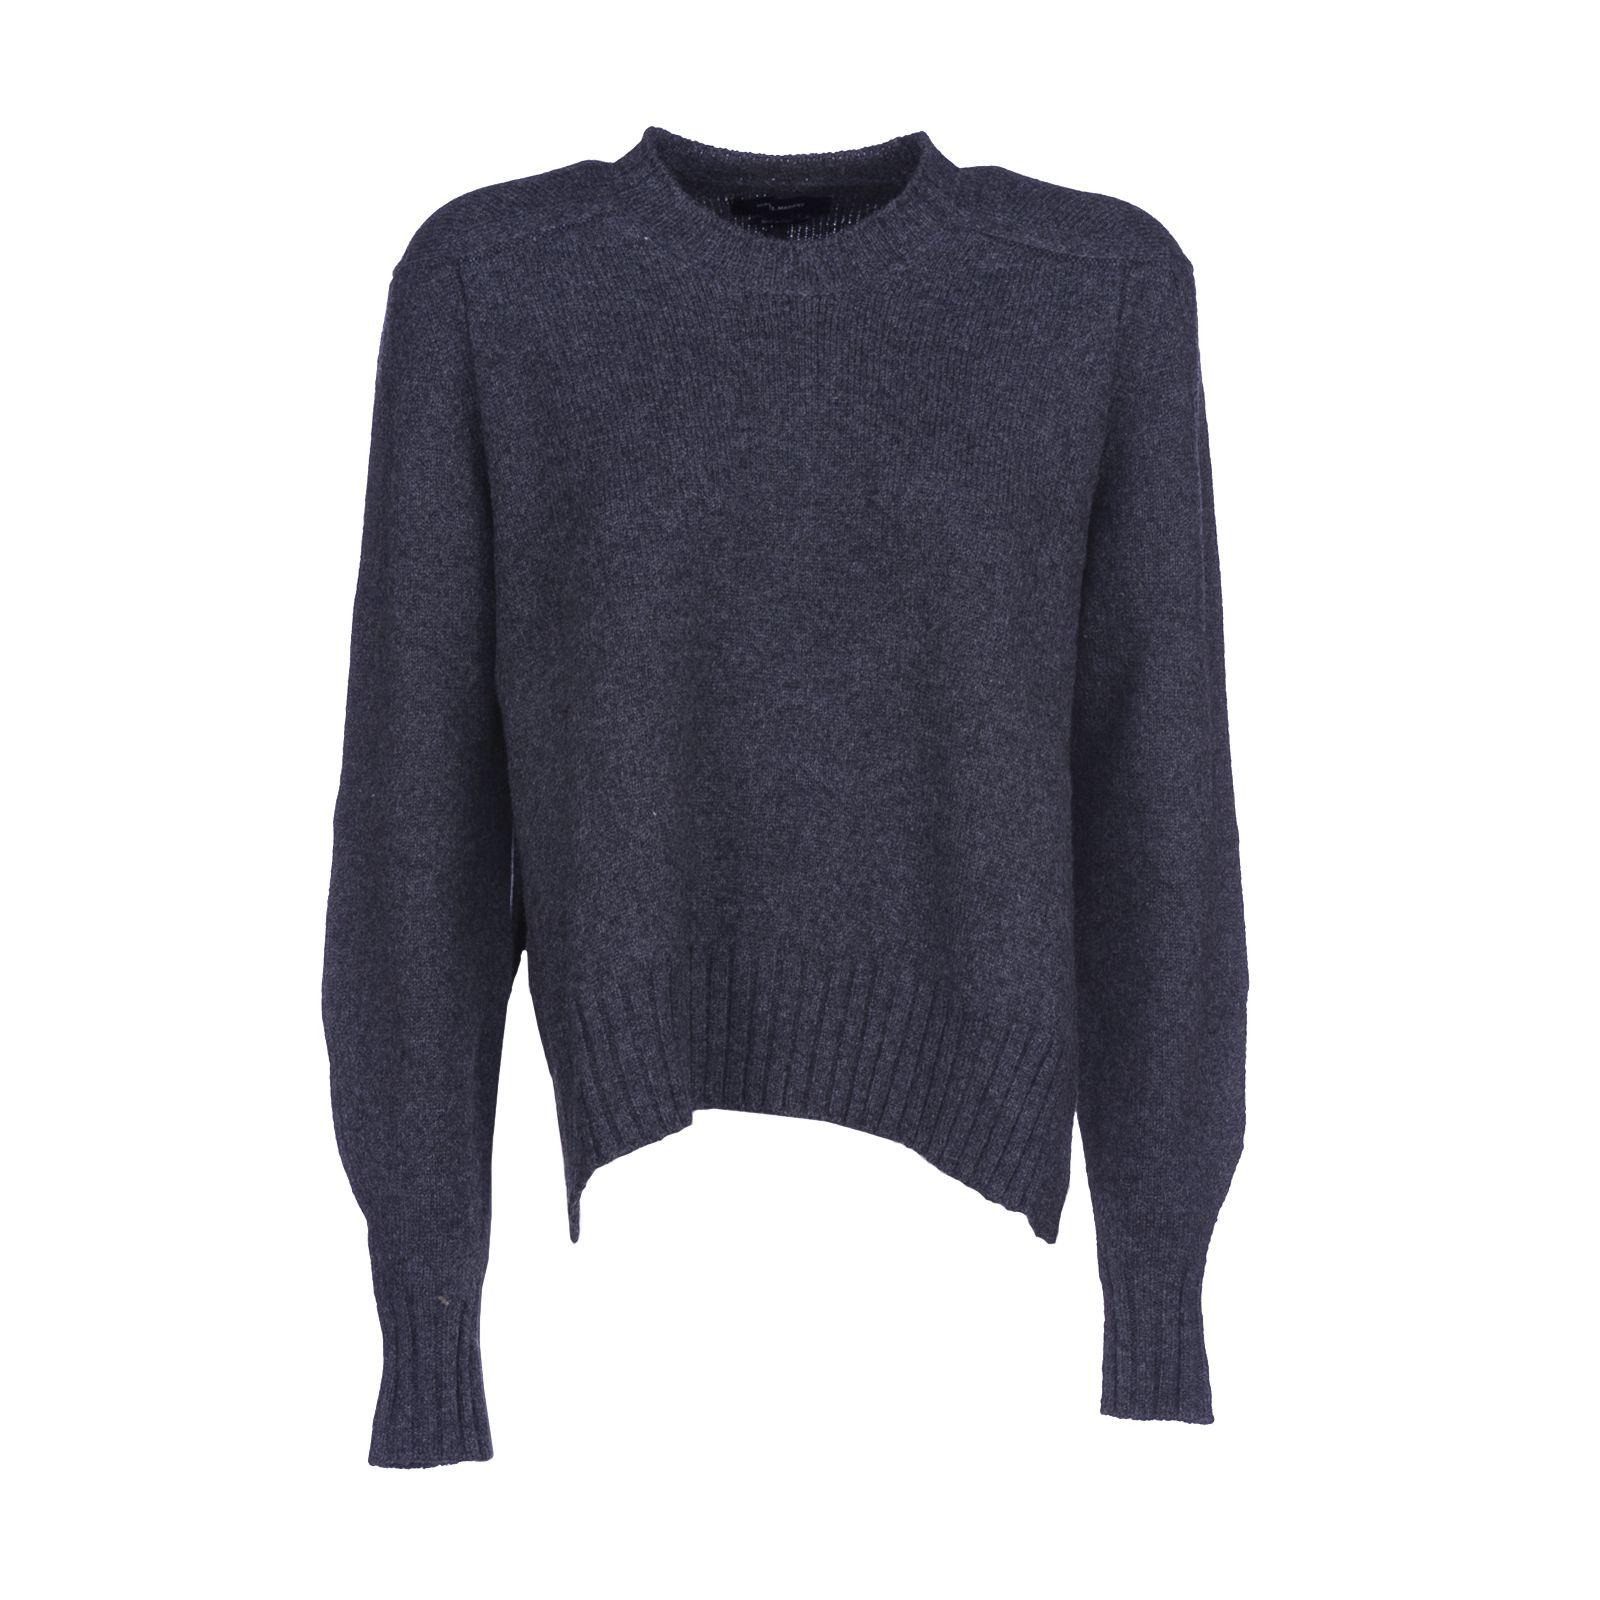 isabel marant isabel marant dinn sweater anthracite women 39 s sweaters italist. Black Bedroom Furniture Sets. Home Design Ideas